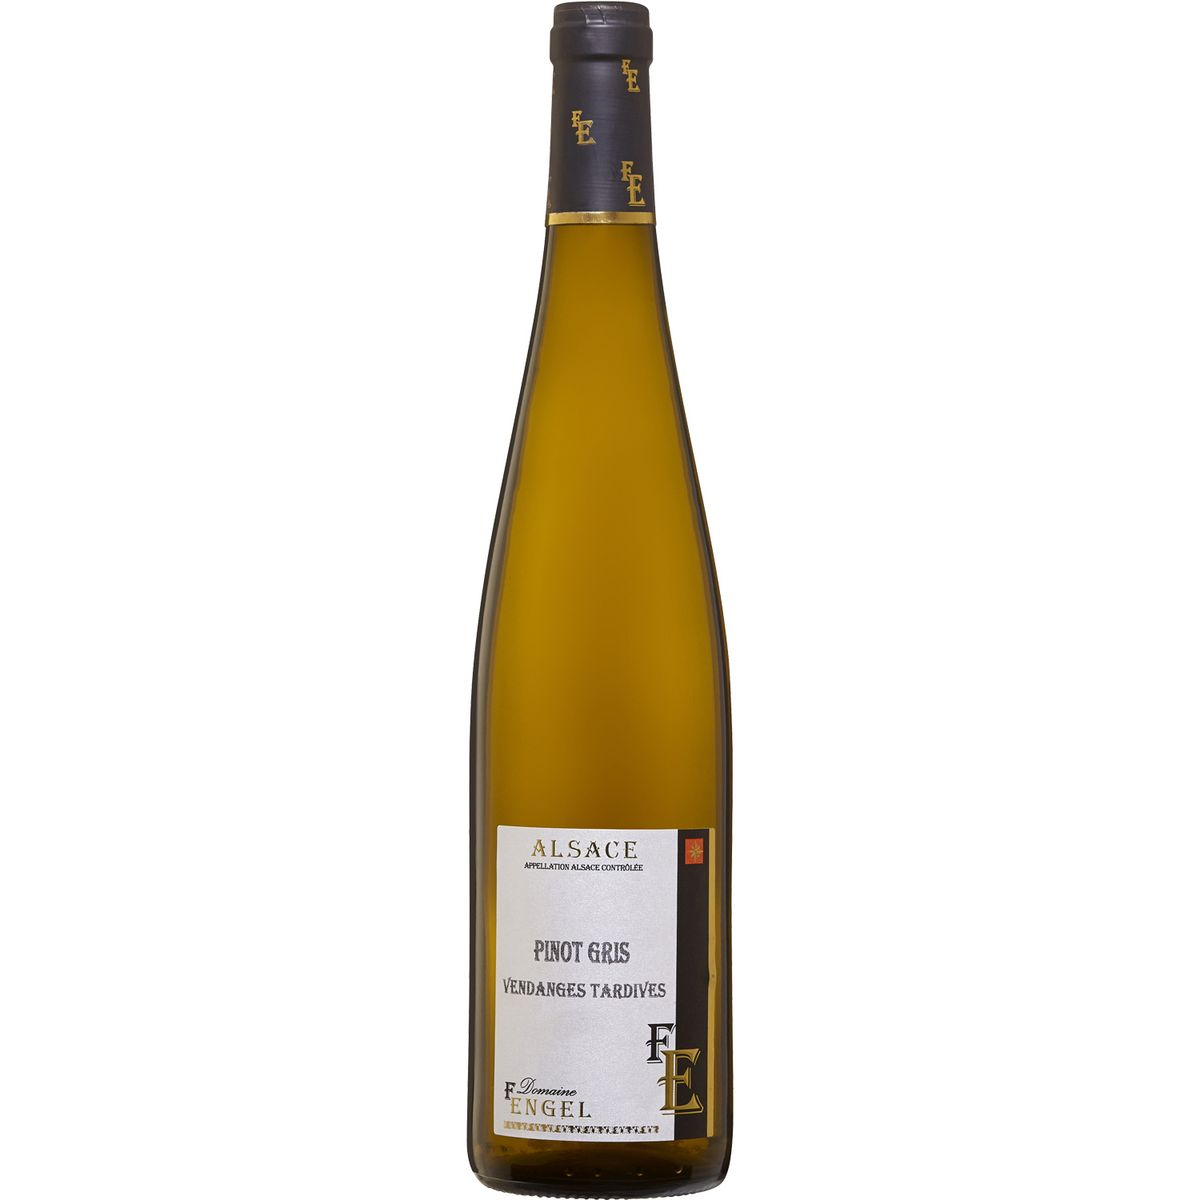 AOP Alsace Pinot gris bio Domaine Engel Ollwiller grand cru blanc